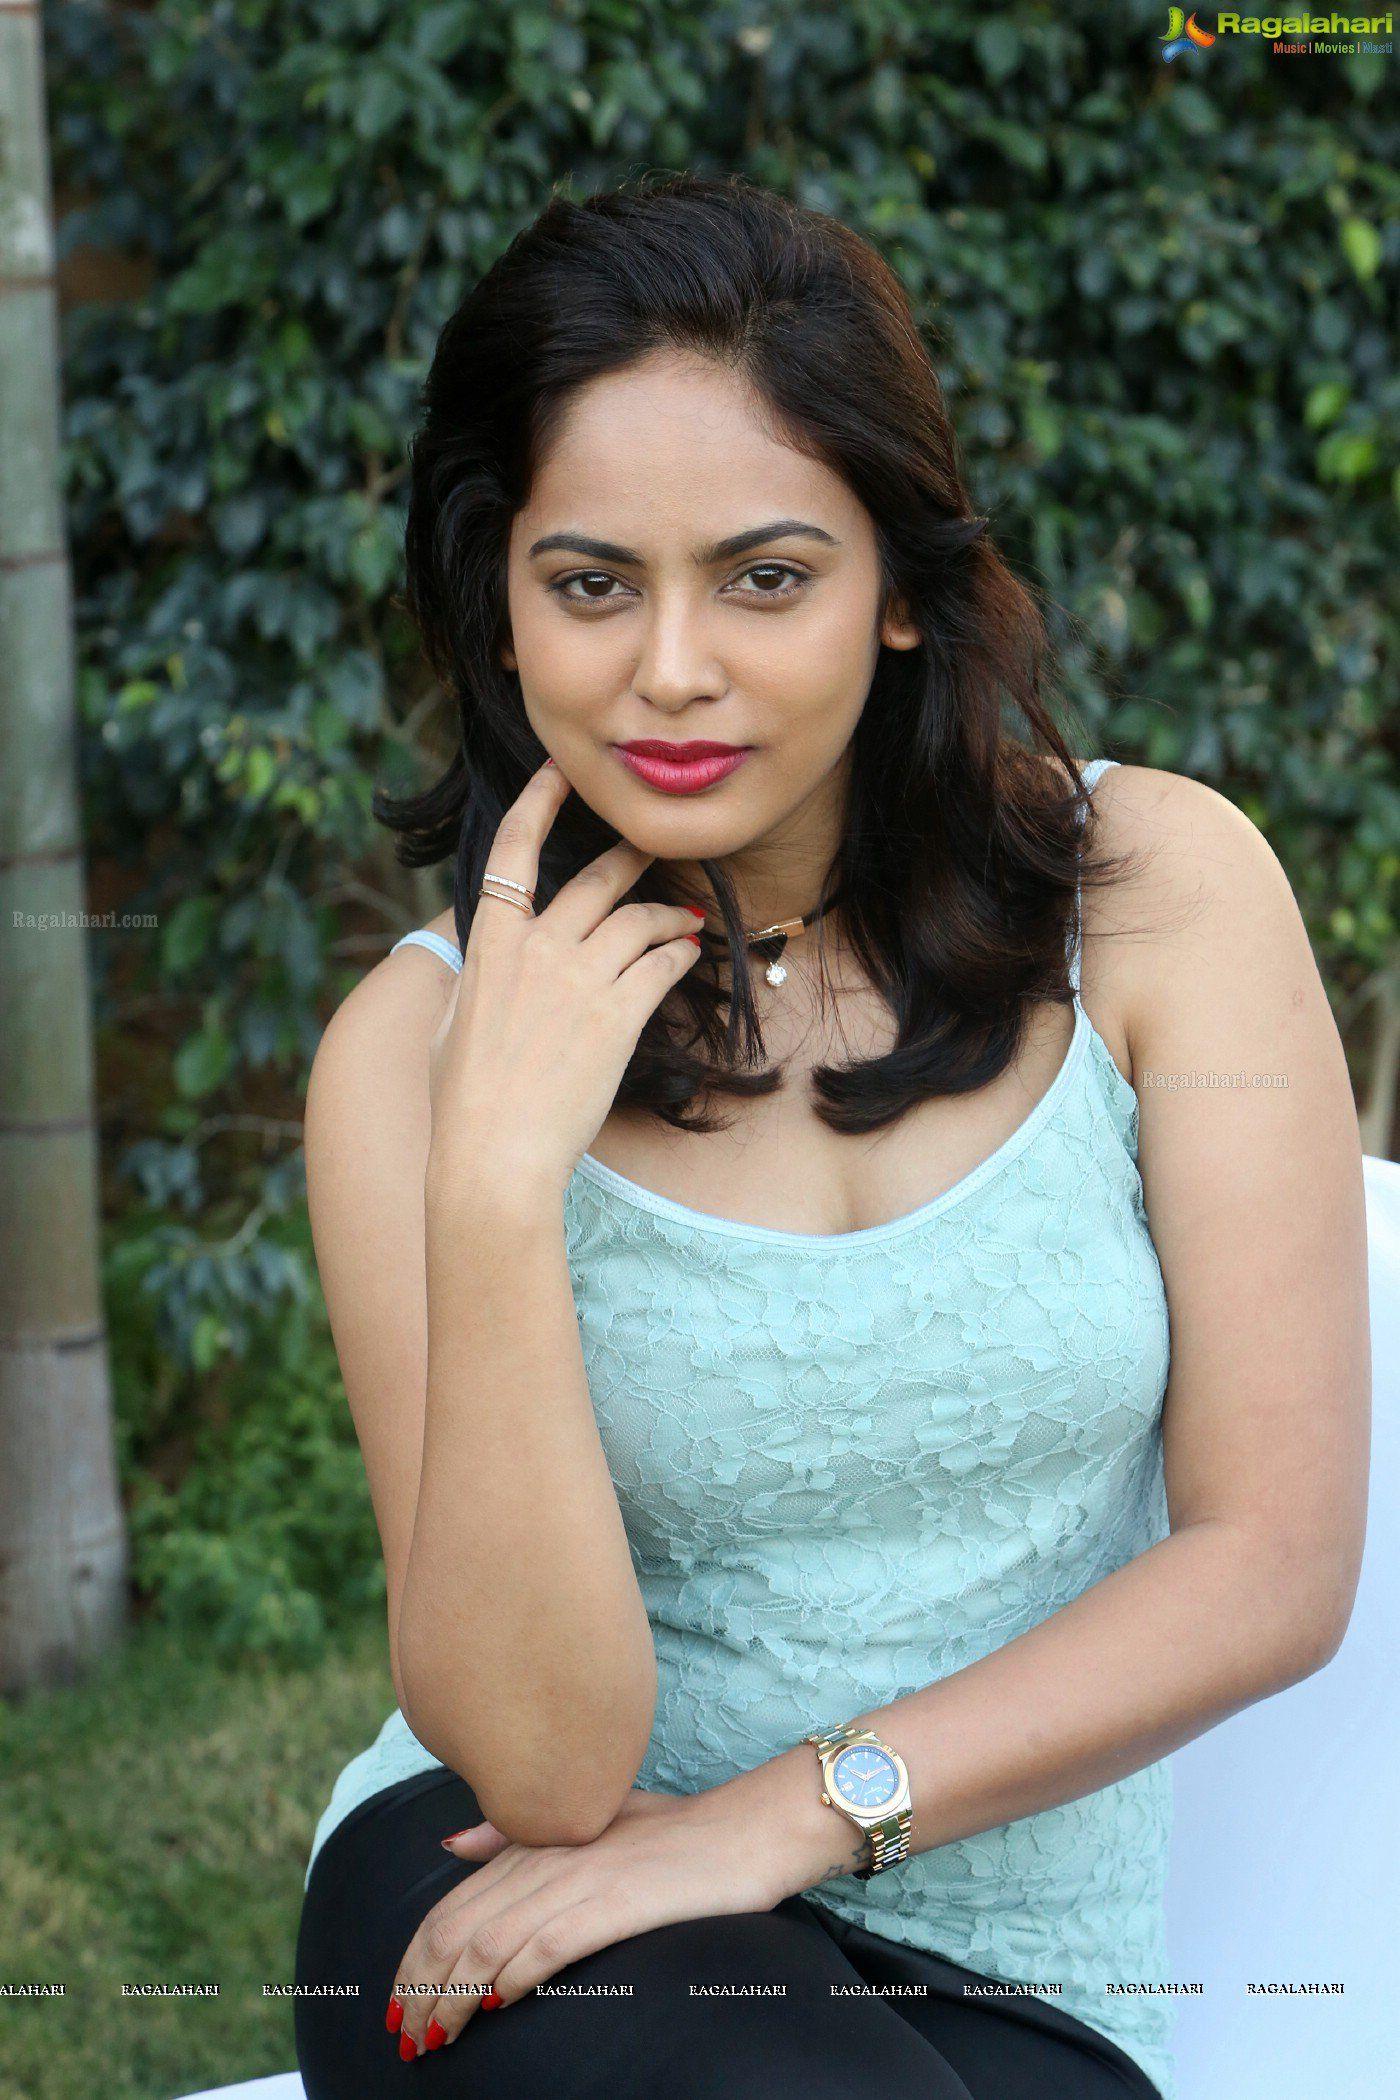 Check Out Beautiful Tamil Heroine Nandita Swetha In Sleeveless Dress